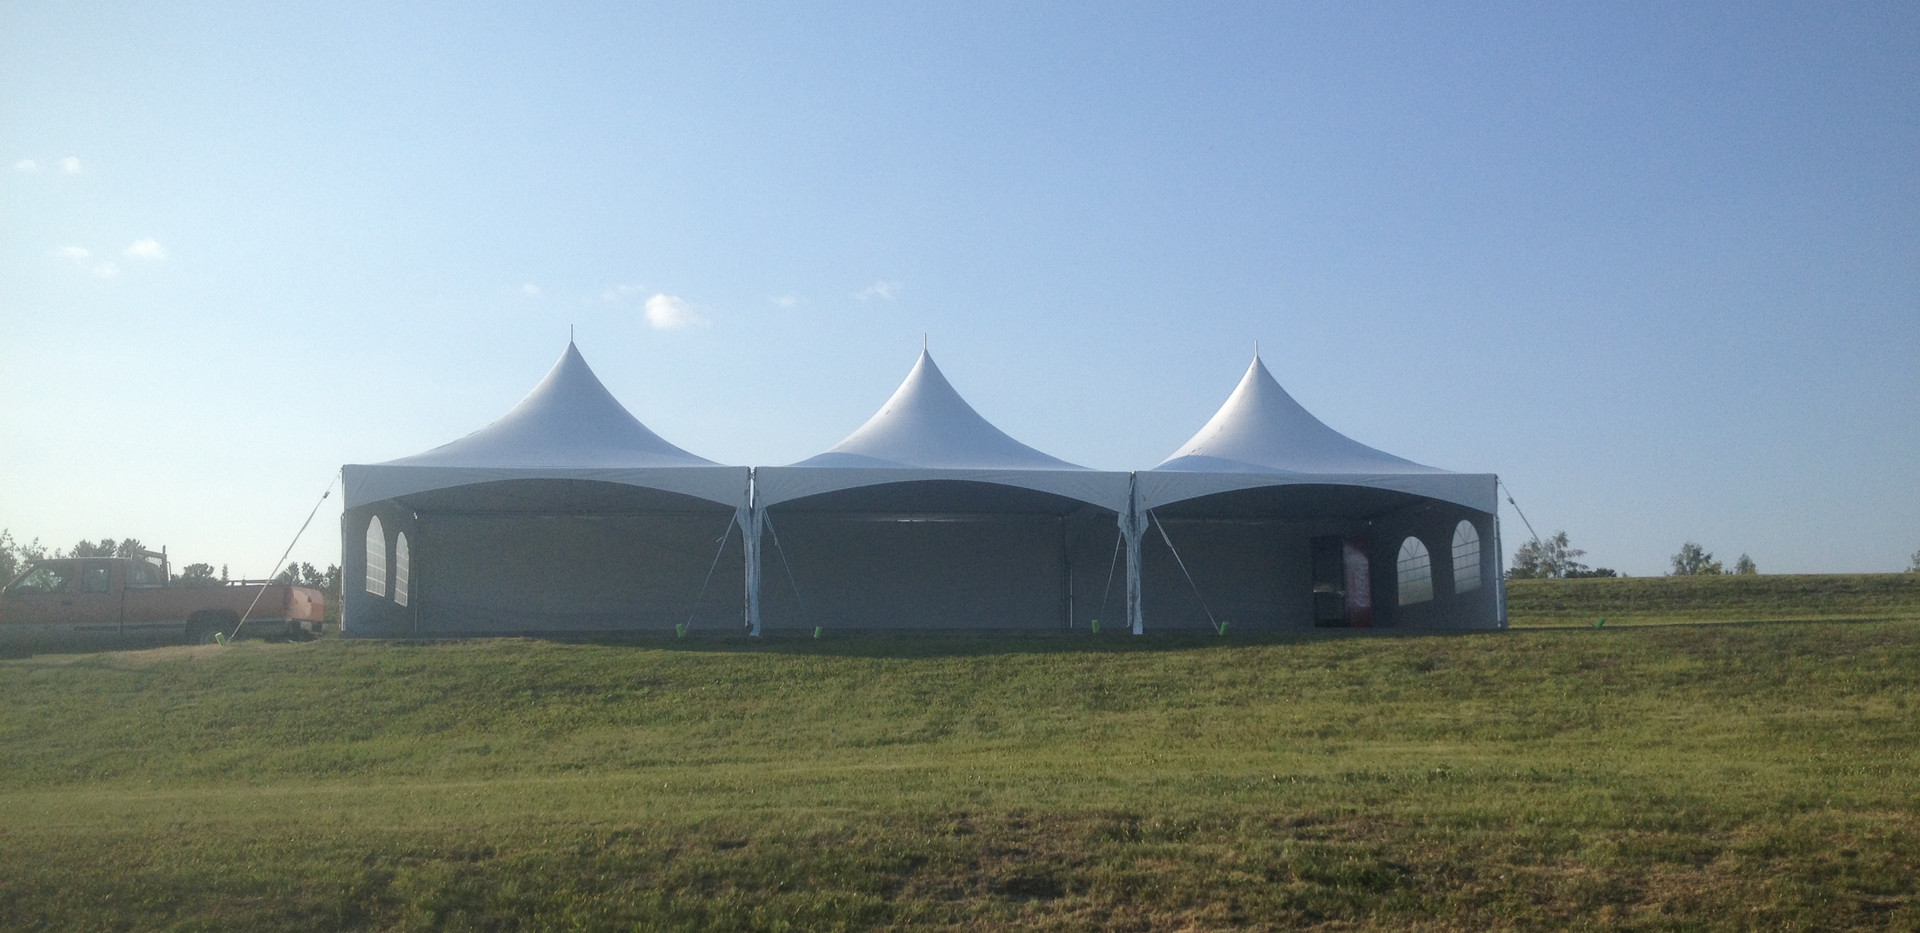 Chapiteaux tente pole pic (Peak Pole Tent)